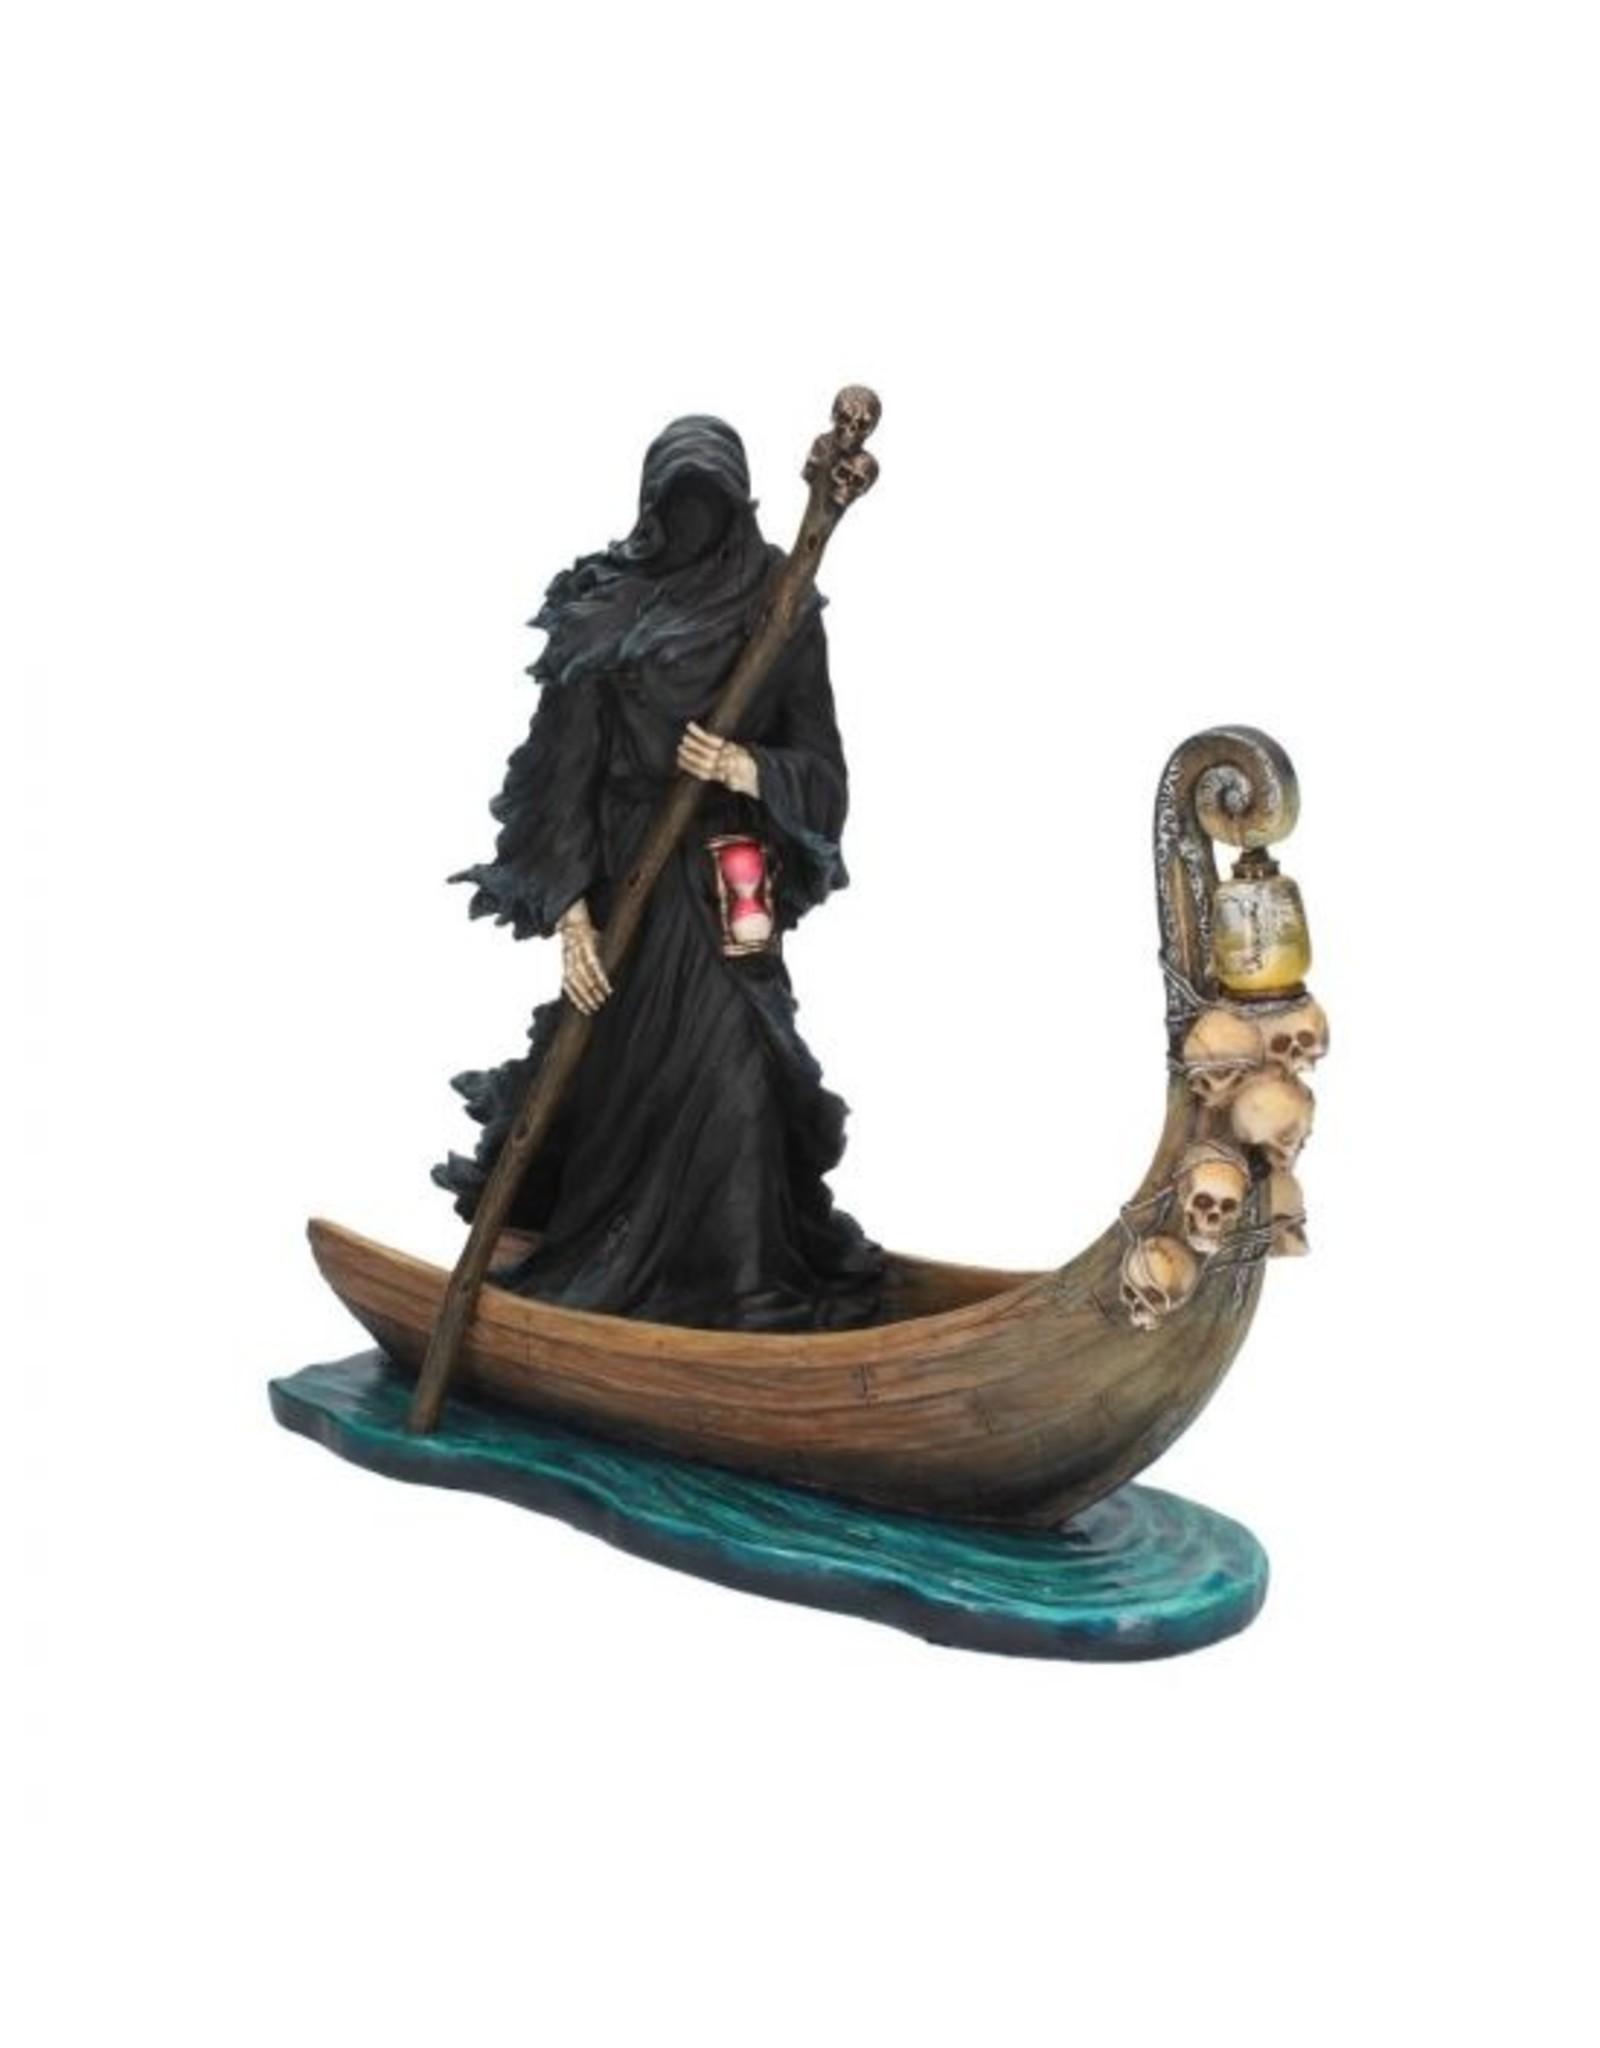 Charon - Ferryman of the Underworld 27 cm